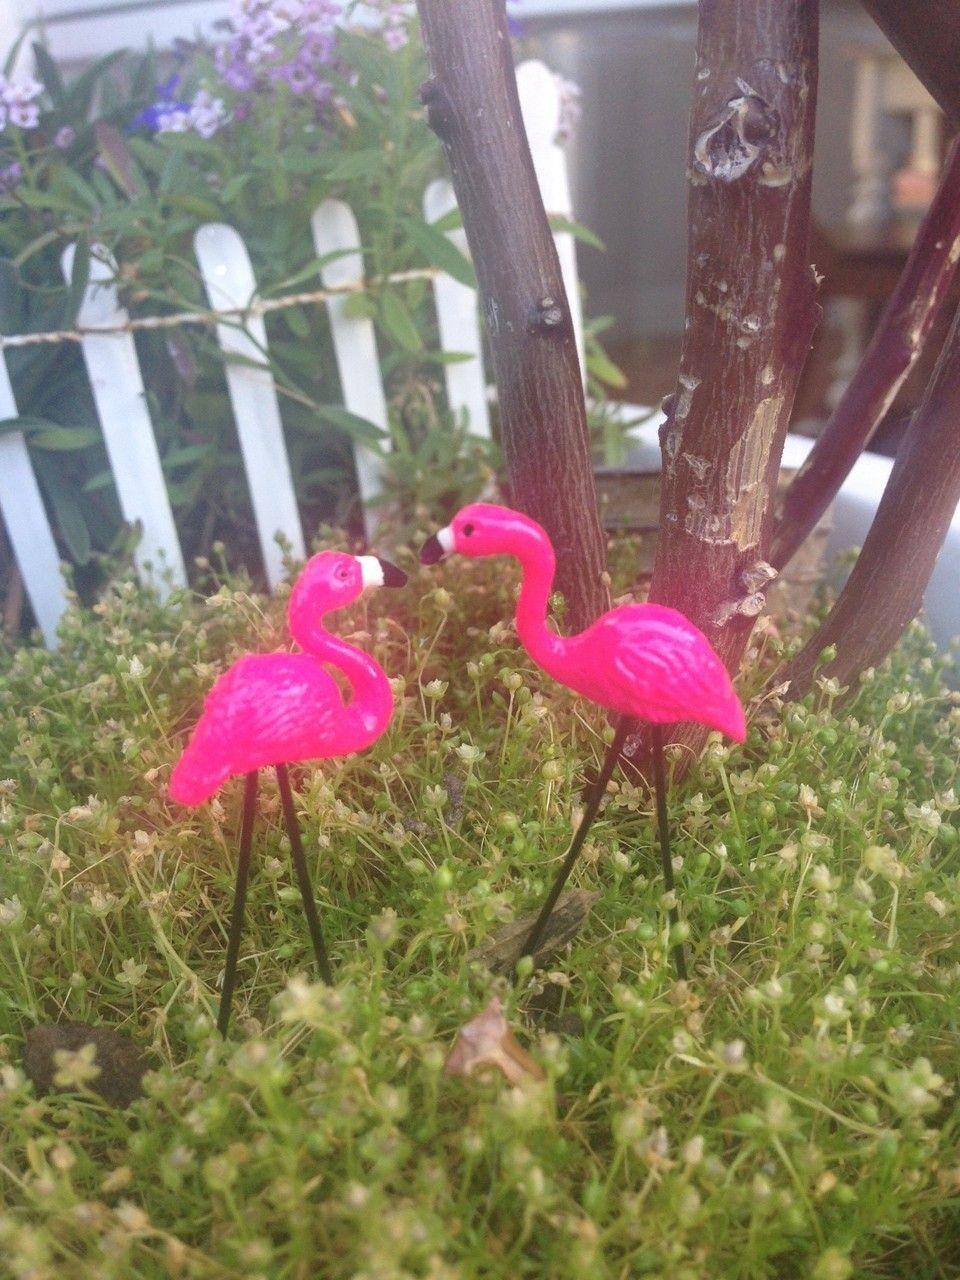 Mailbox Rustic (Opens) Pink flamingos, Christmas